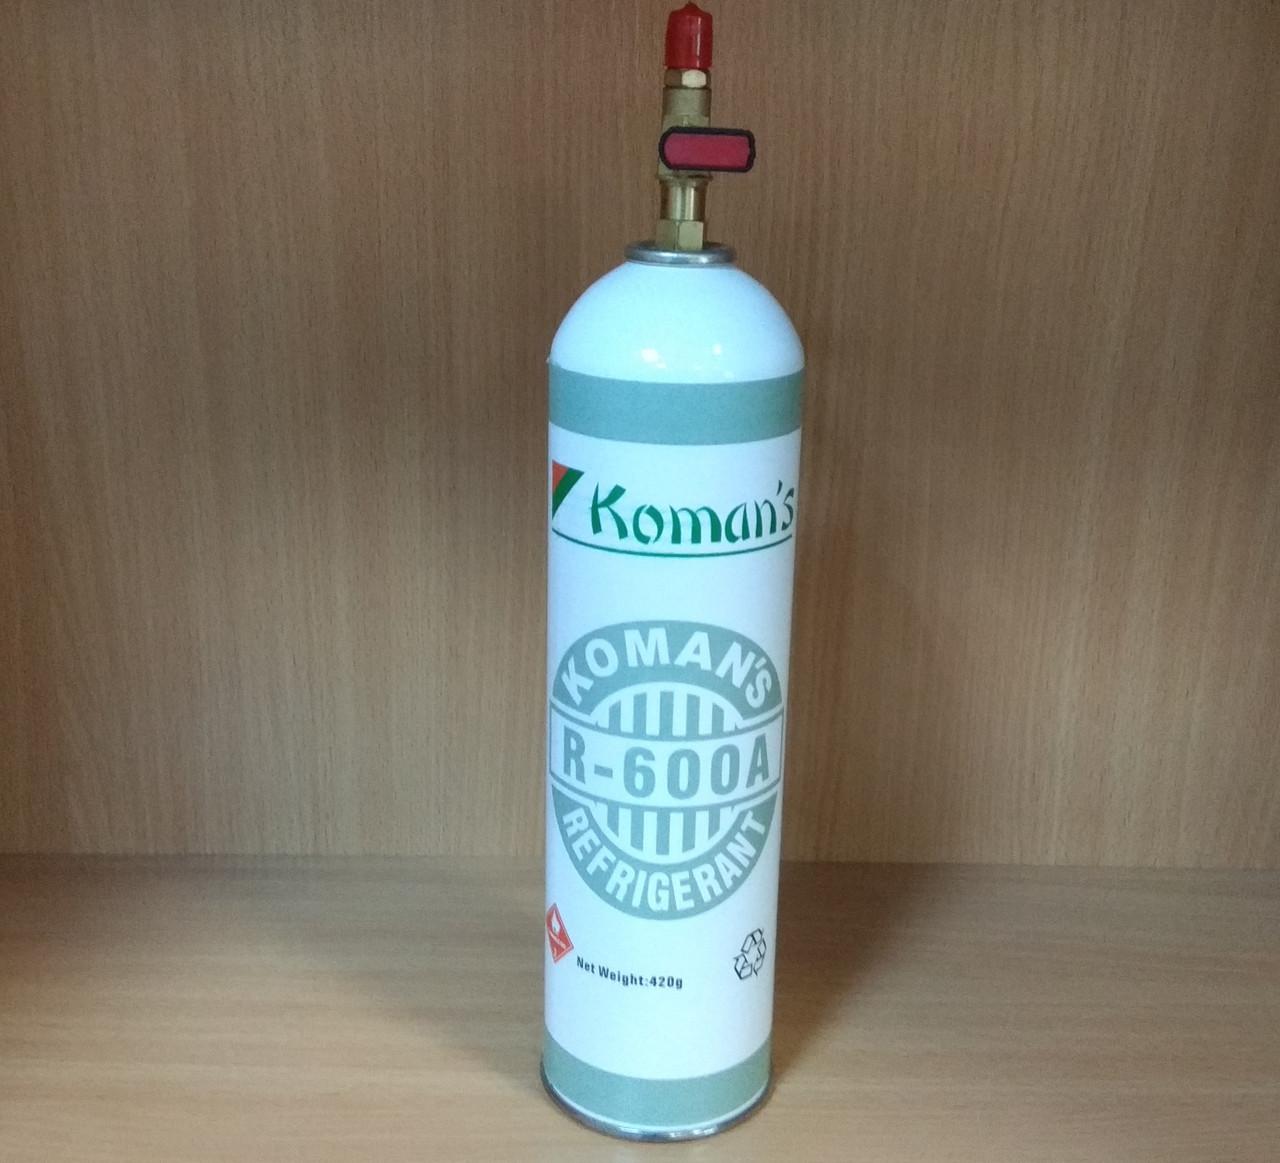 Фреон R600a (изобутан - 420 г.)